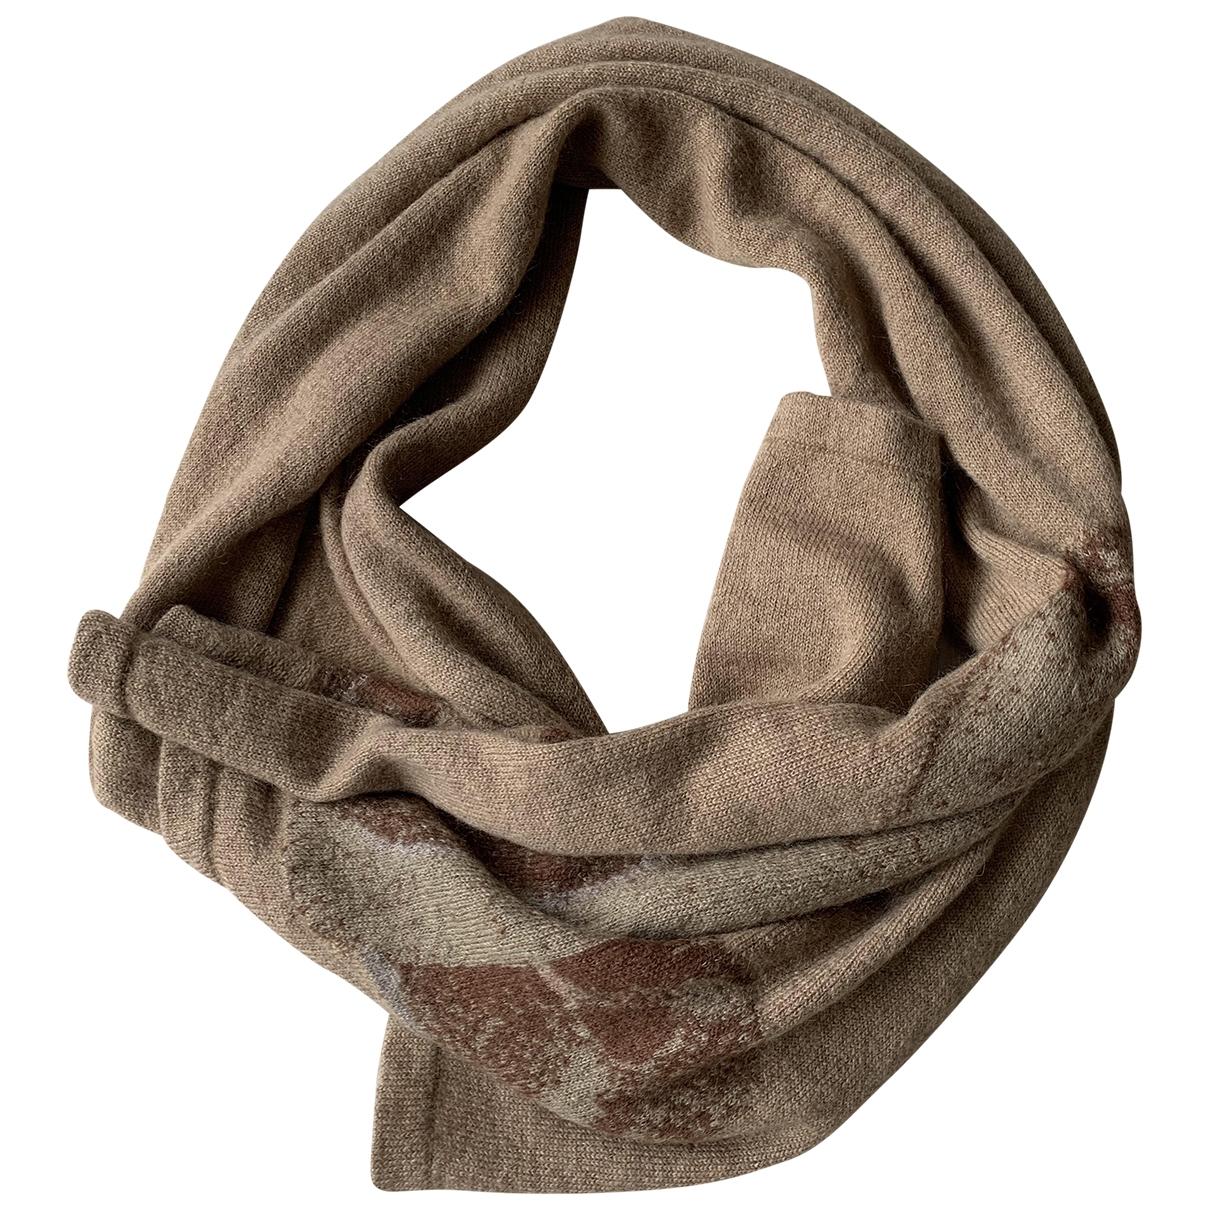 Givenchy \N Beige Wool scarf for Women \N